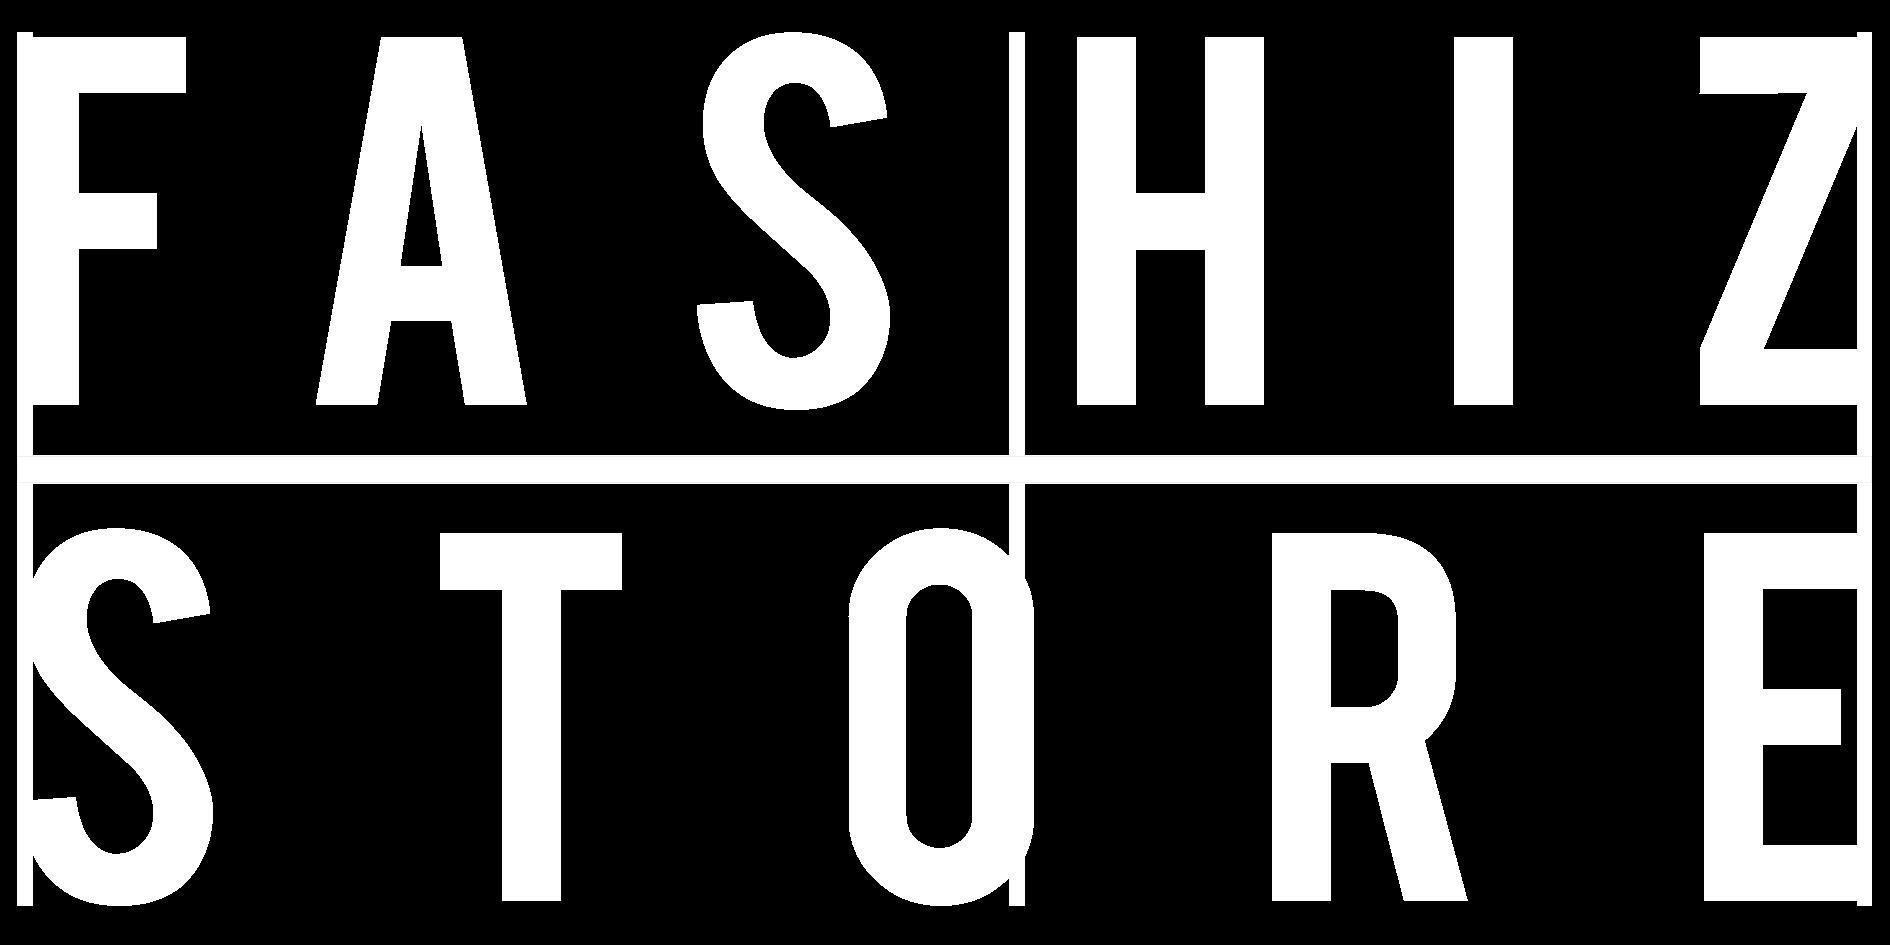 Fashizstore by Fashizblack